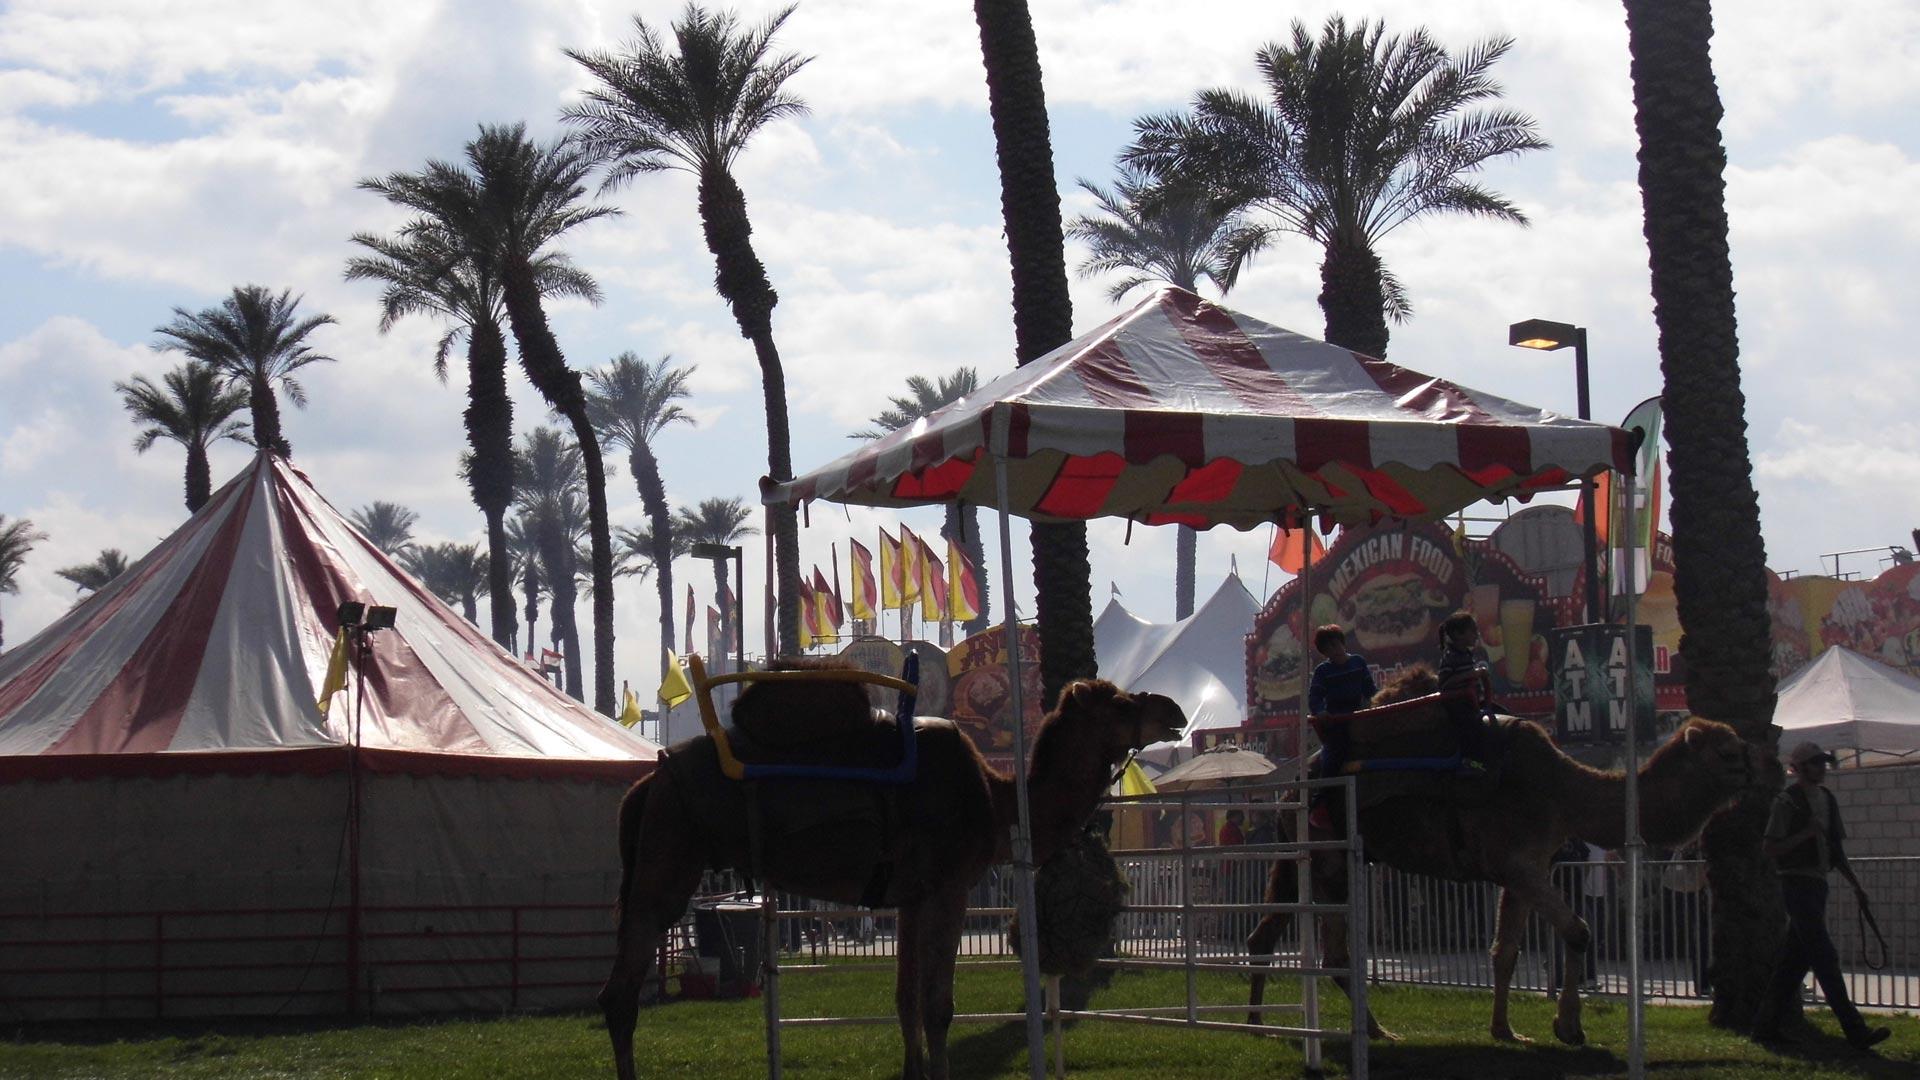 riverside fair